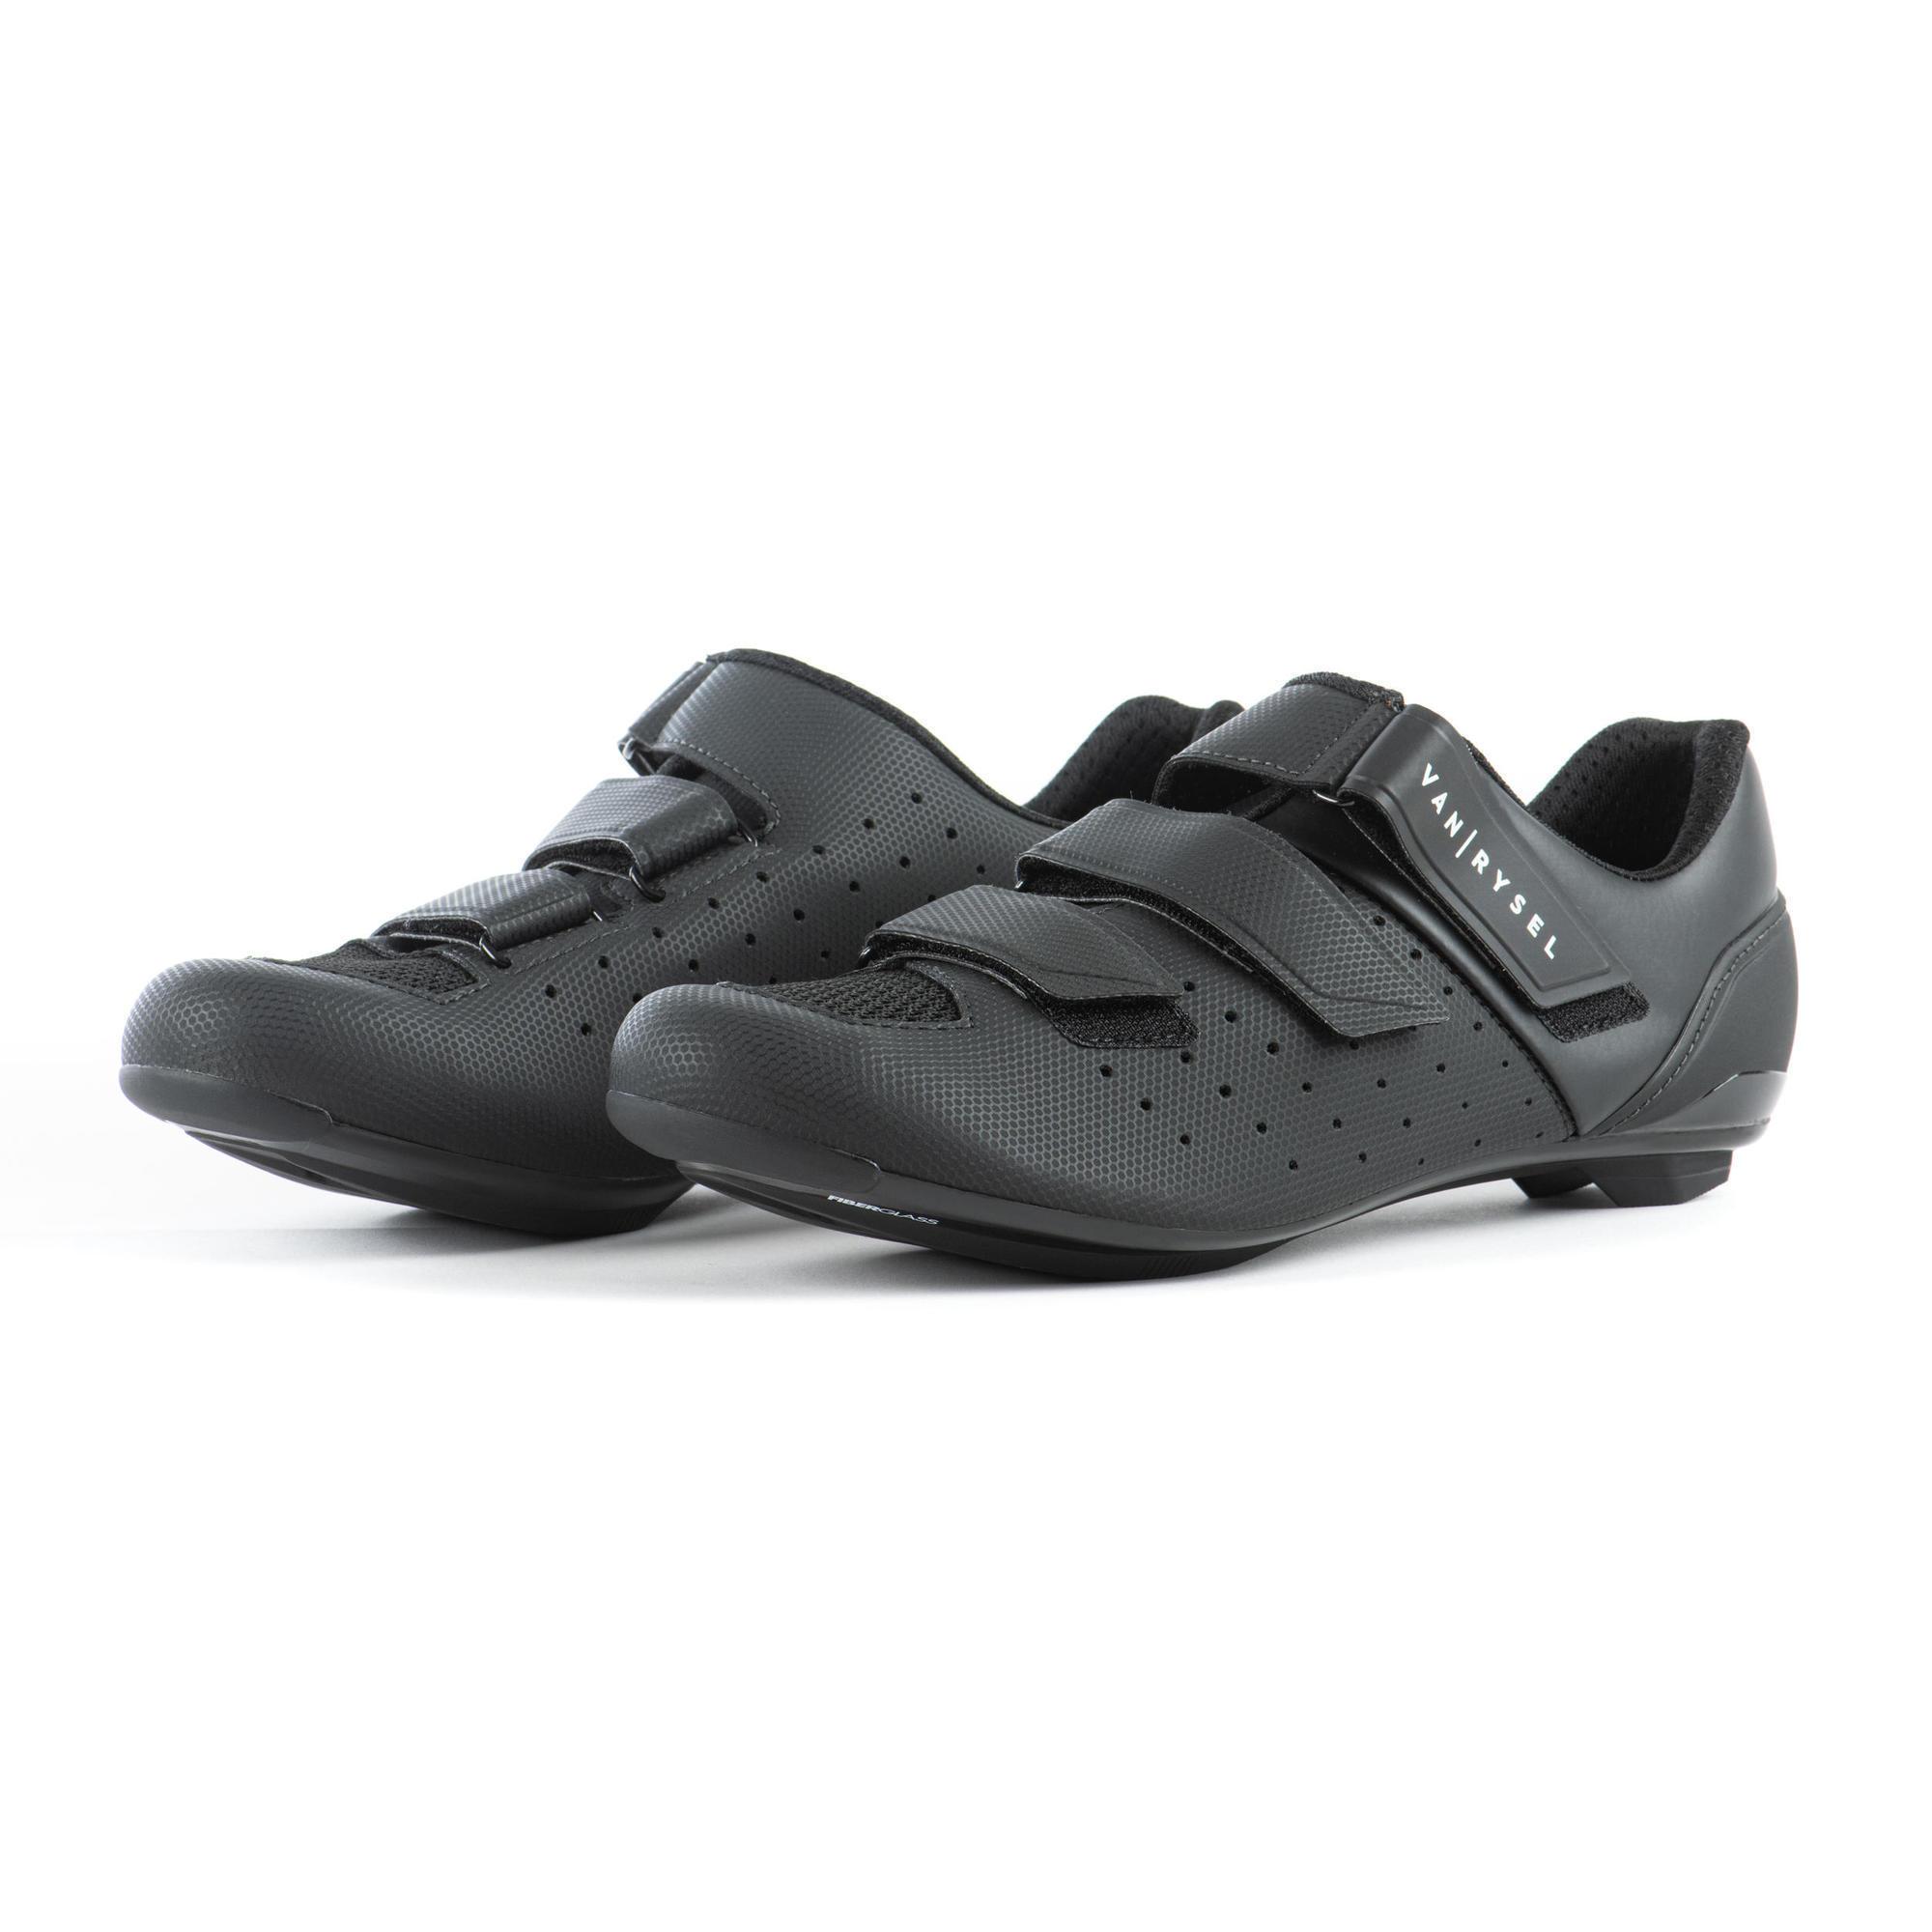 Fahrrad-Schuhe Rennrad RR 500 | Schuhe > Sportschuhe > Fahrradschuhe | Van rysel